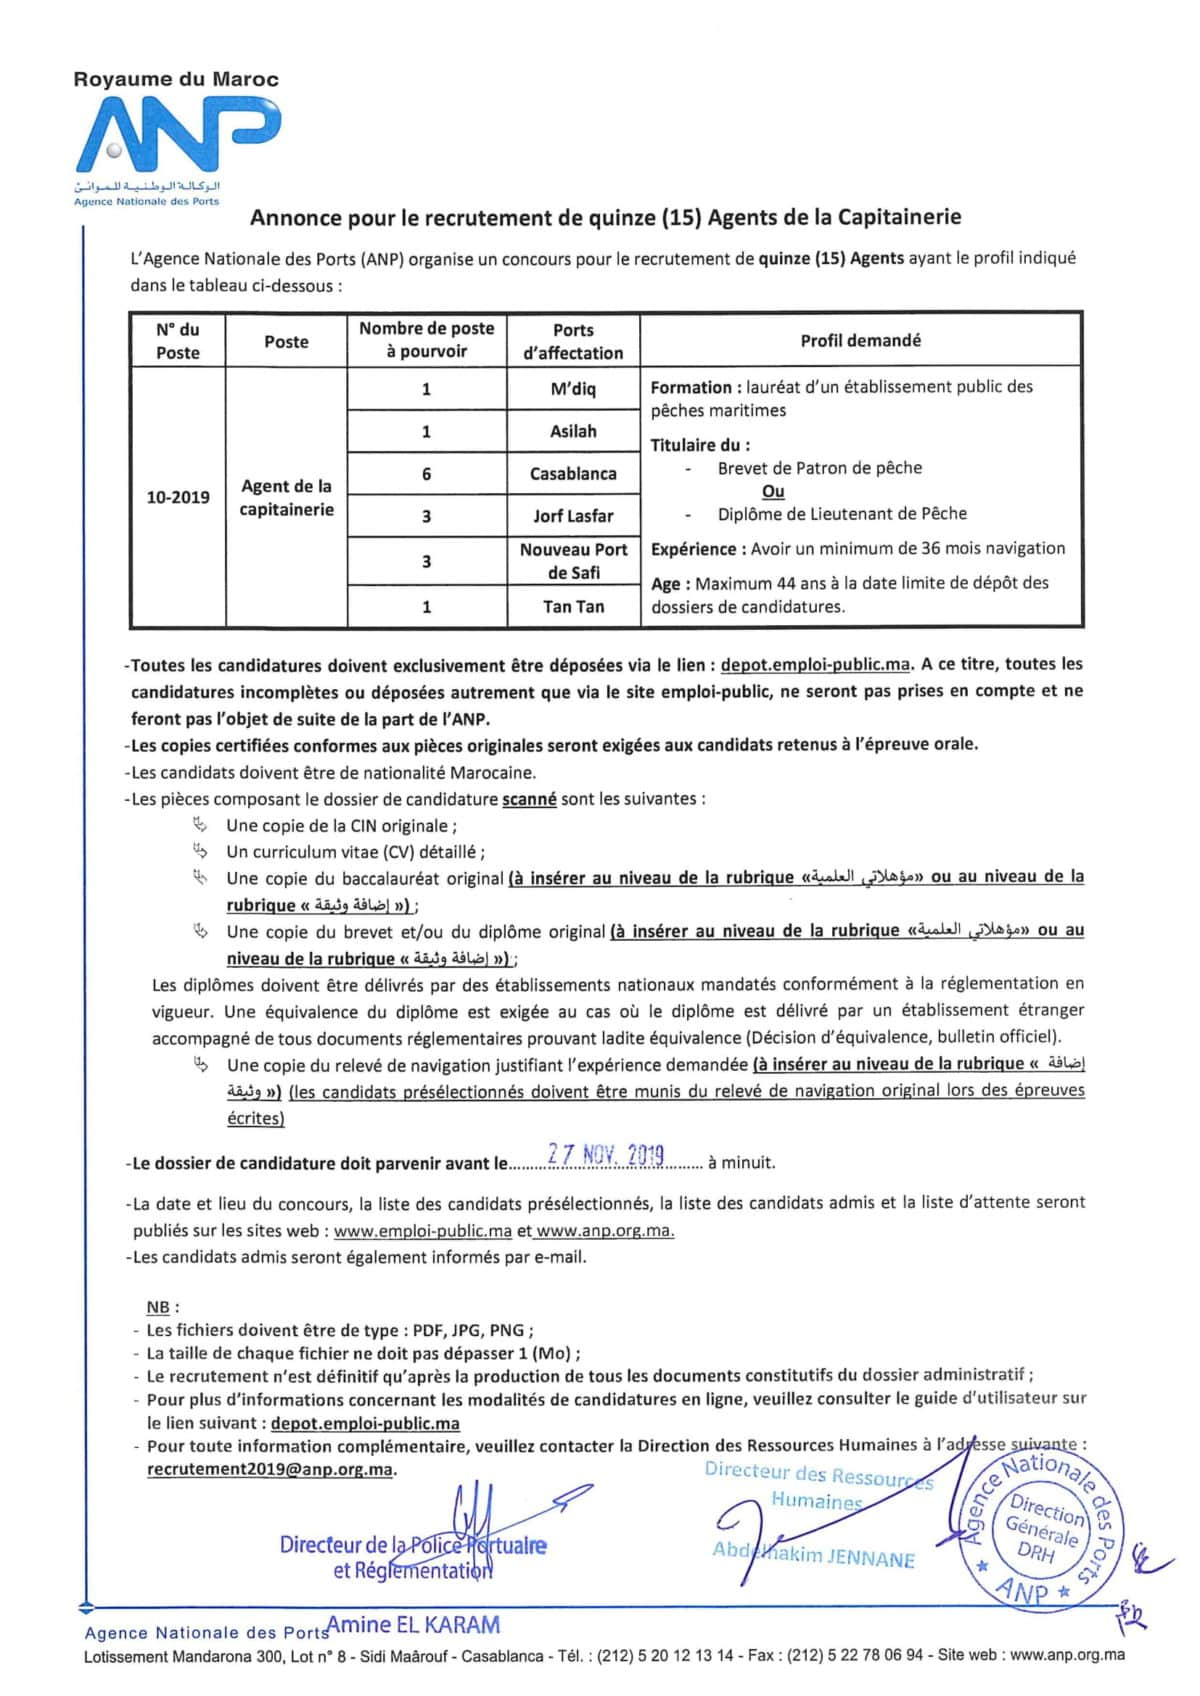 102019AnnonceAgentdelaCapitainerie2019 1 Concours Agence Nationale des Ports (16 Postes)